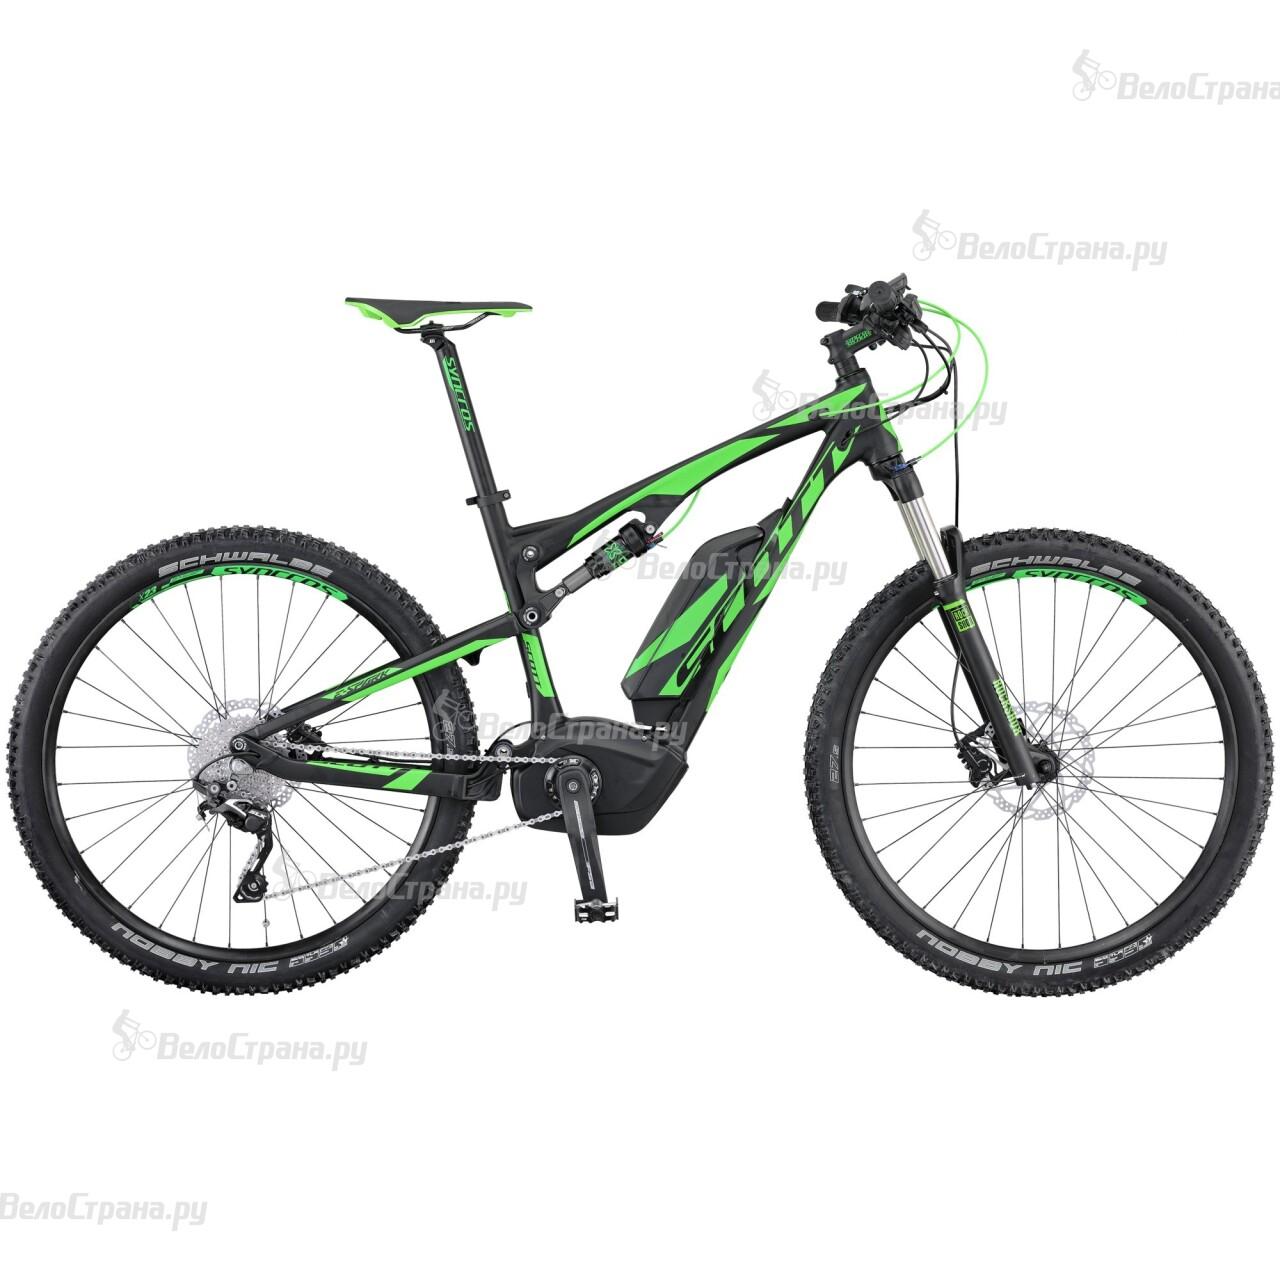 Велосипед Scott E-Spark 720 (2016) scott spark 740 2017